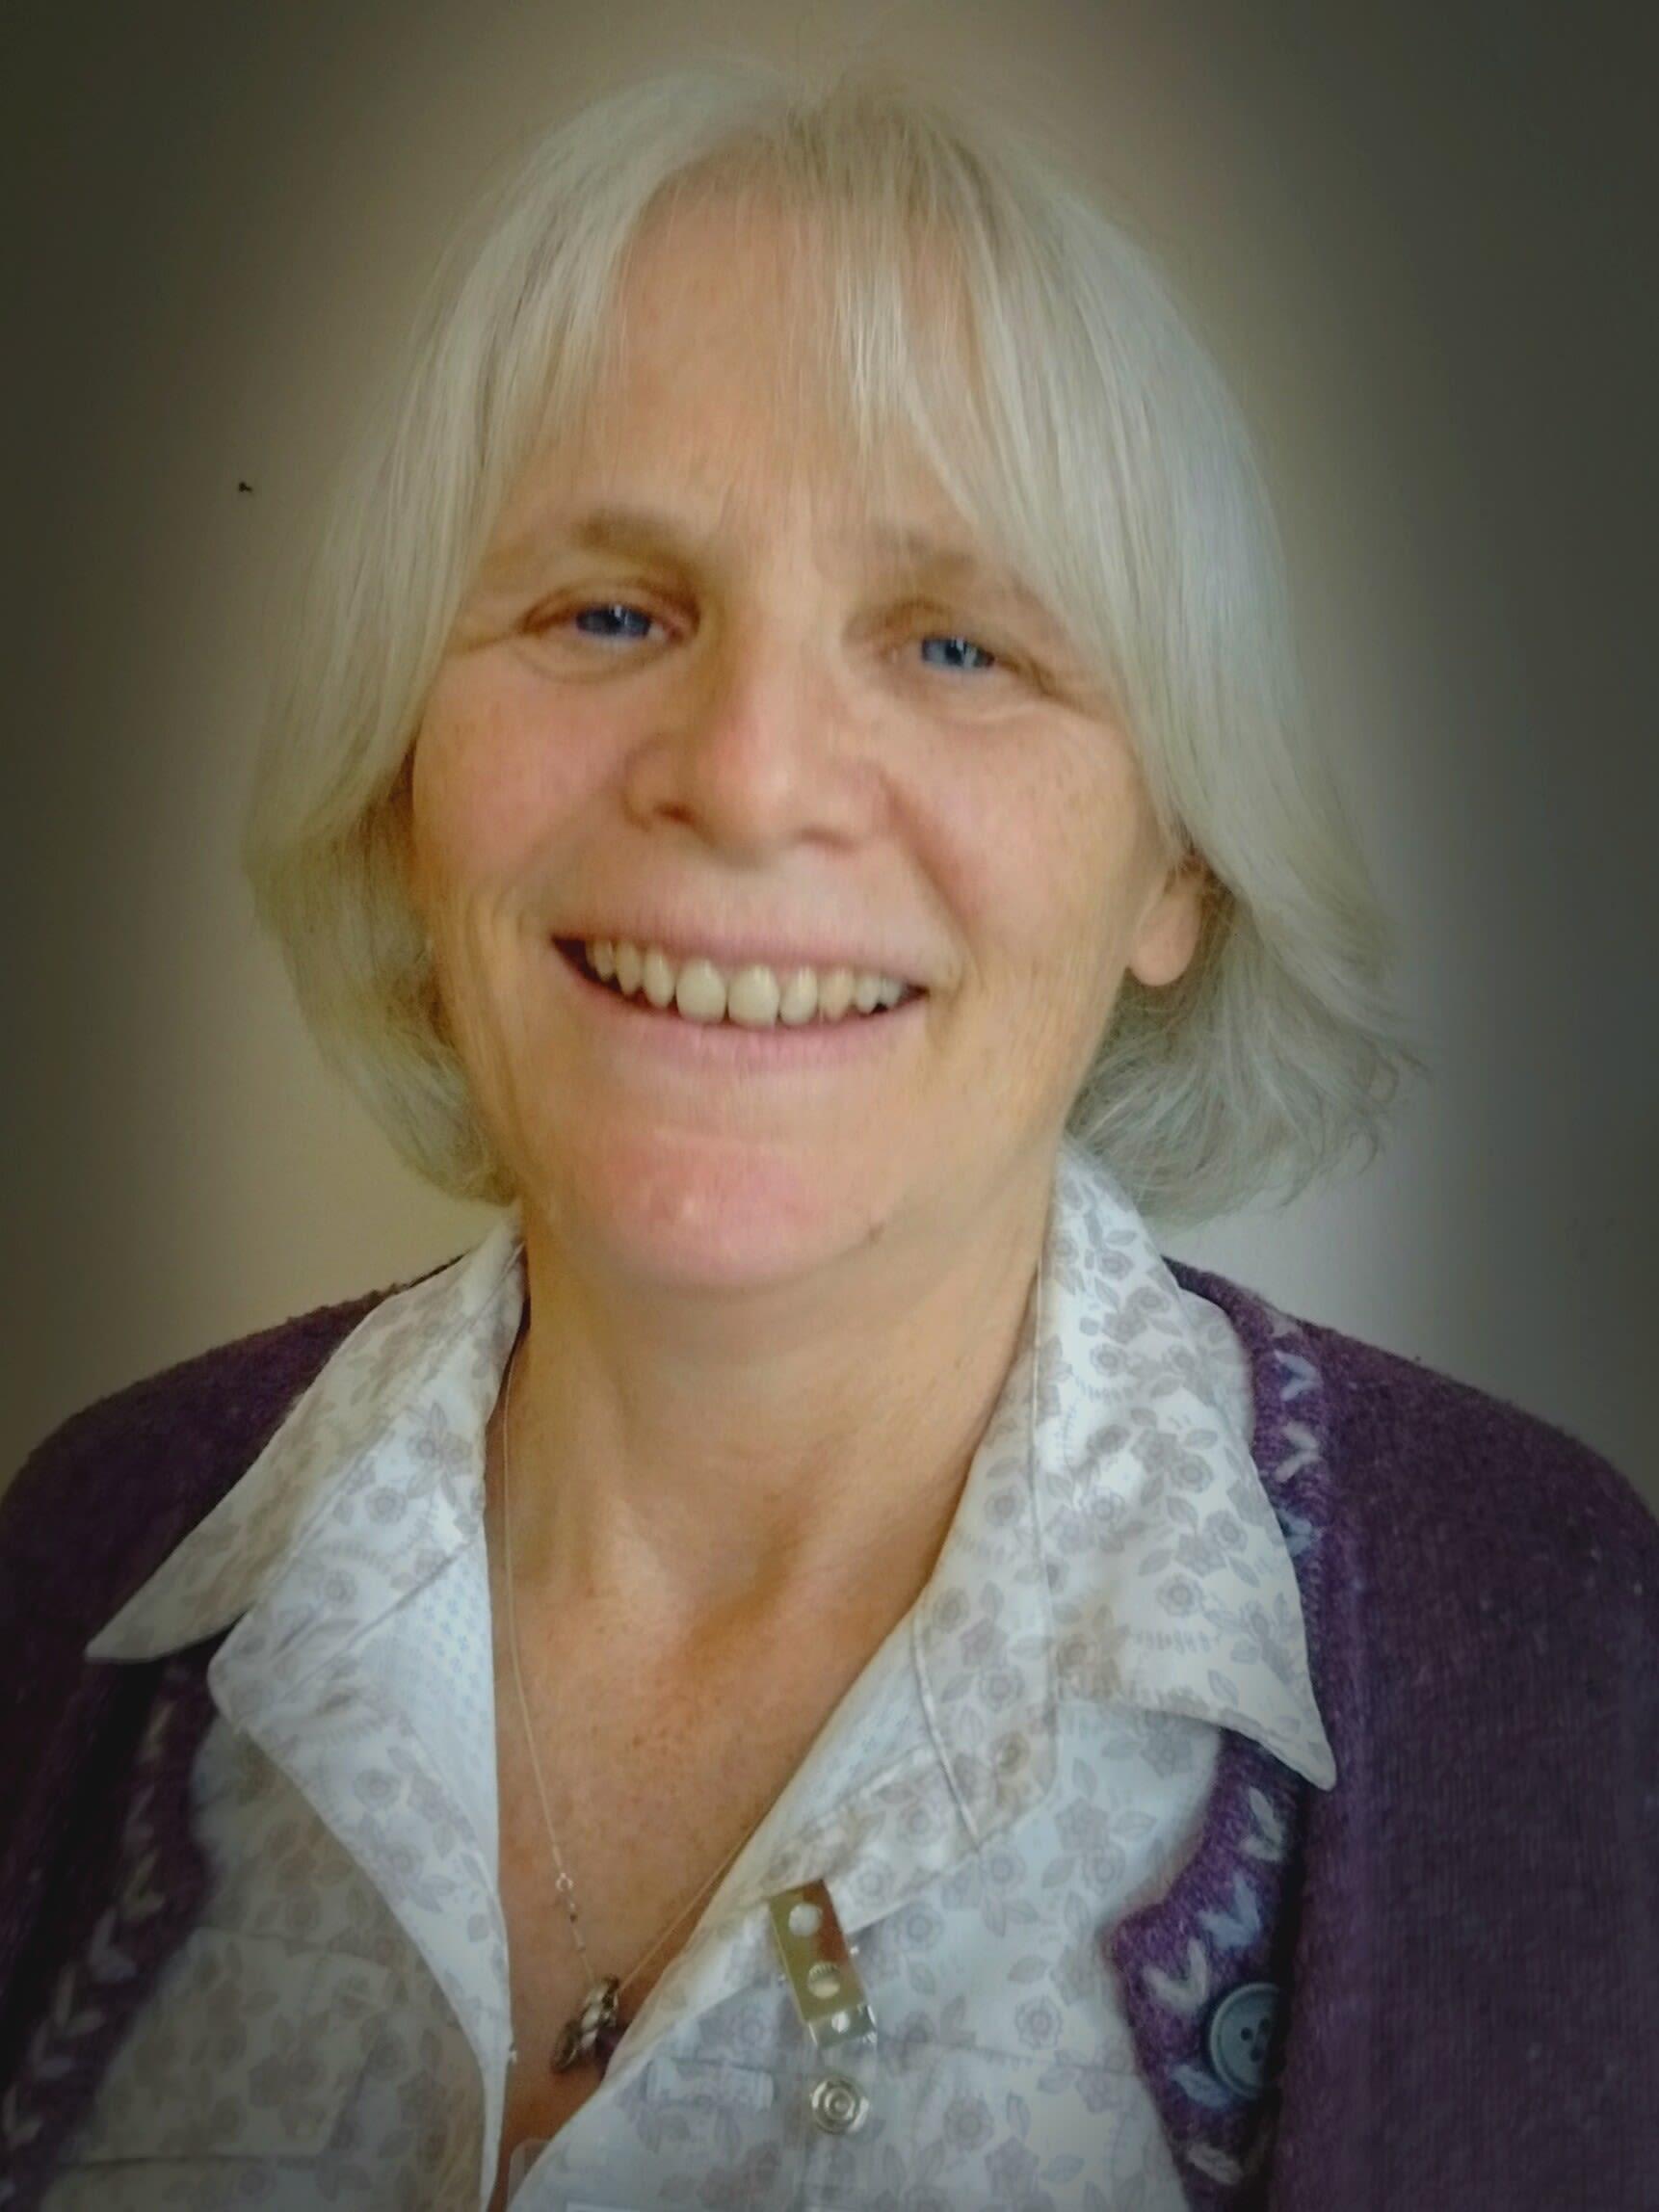 Dea Carson - Scheduling Coordinatorat At Home Care Group in Eugene, Oregon